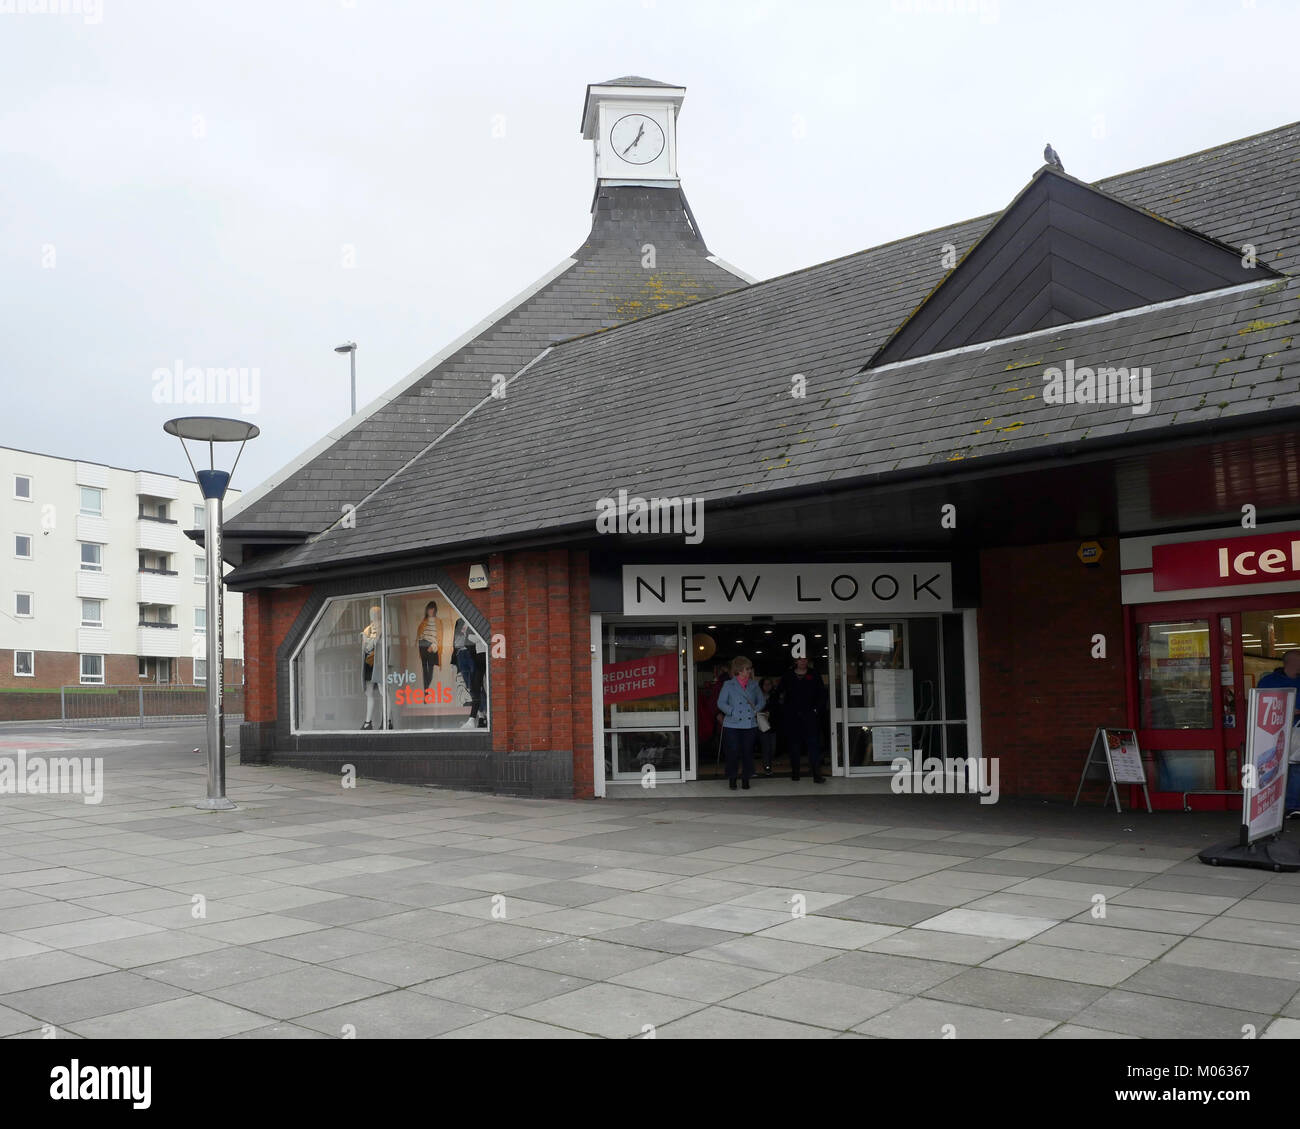 New Look retail store, High Street, Cosham, Portsmouth, Hampshire, England, UK Stock Photo